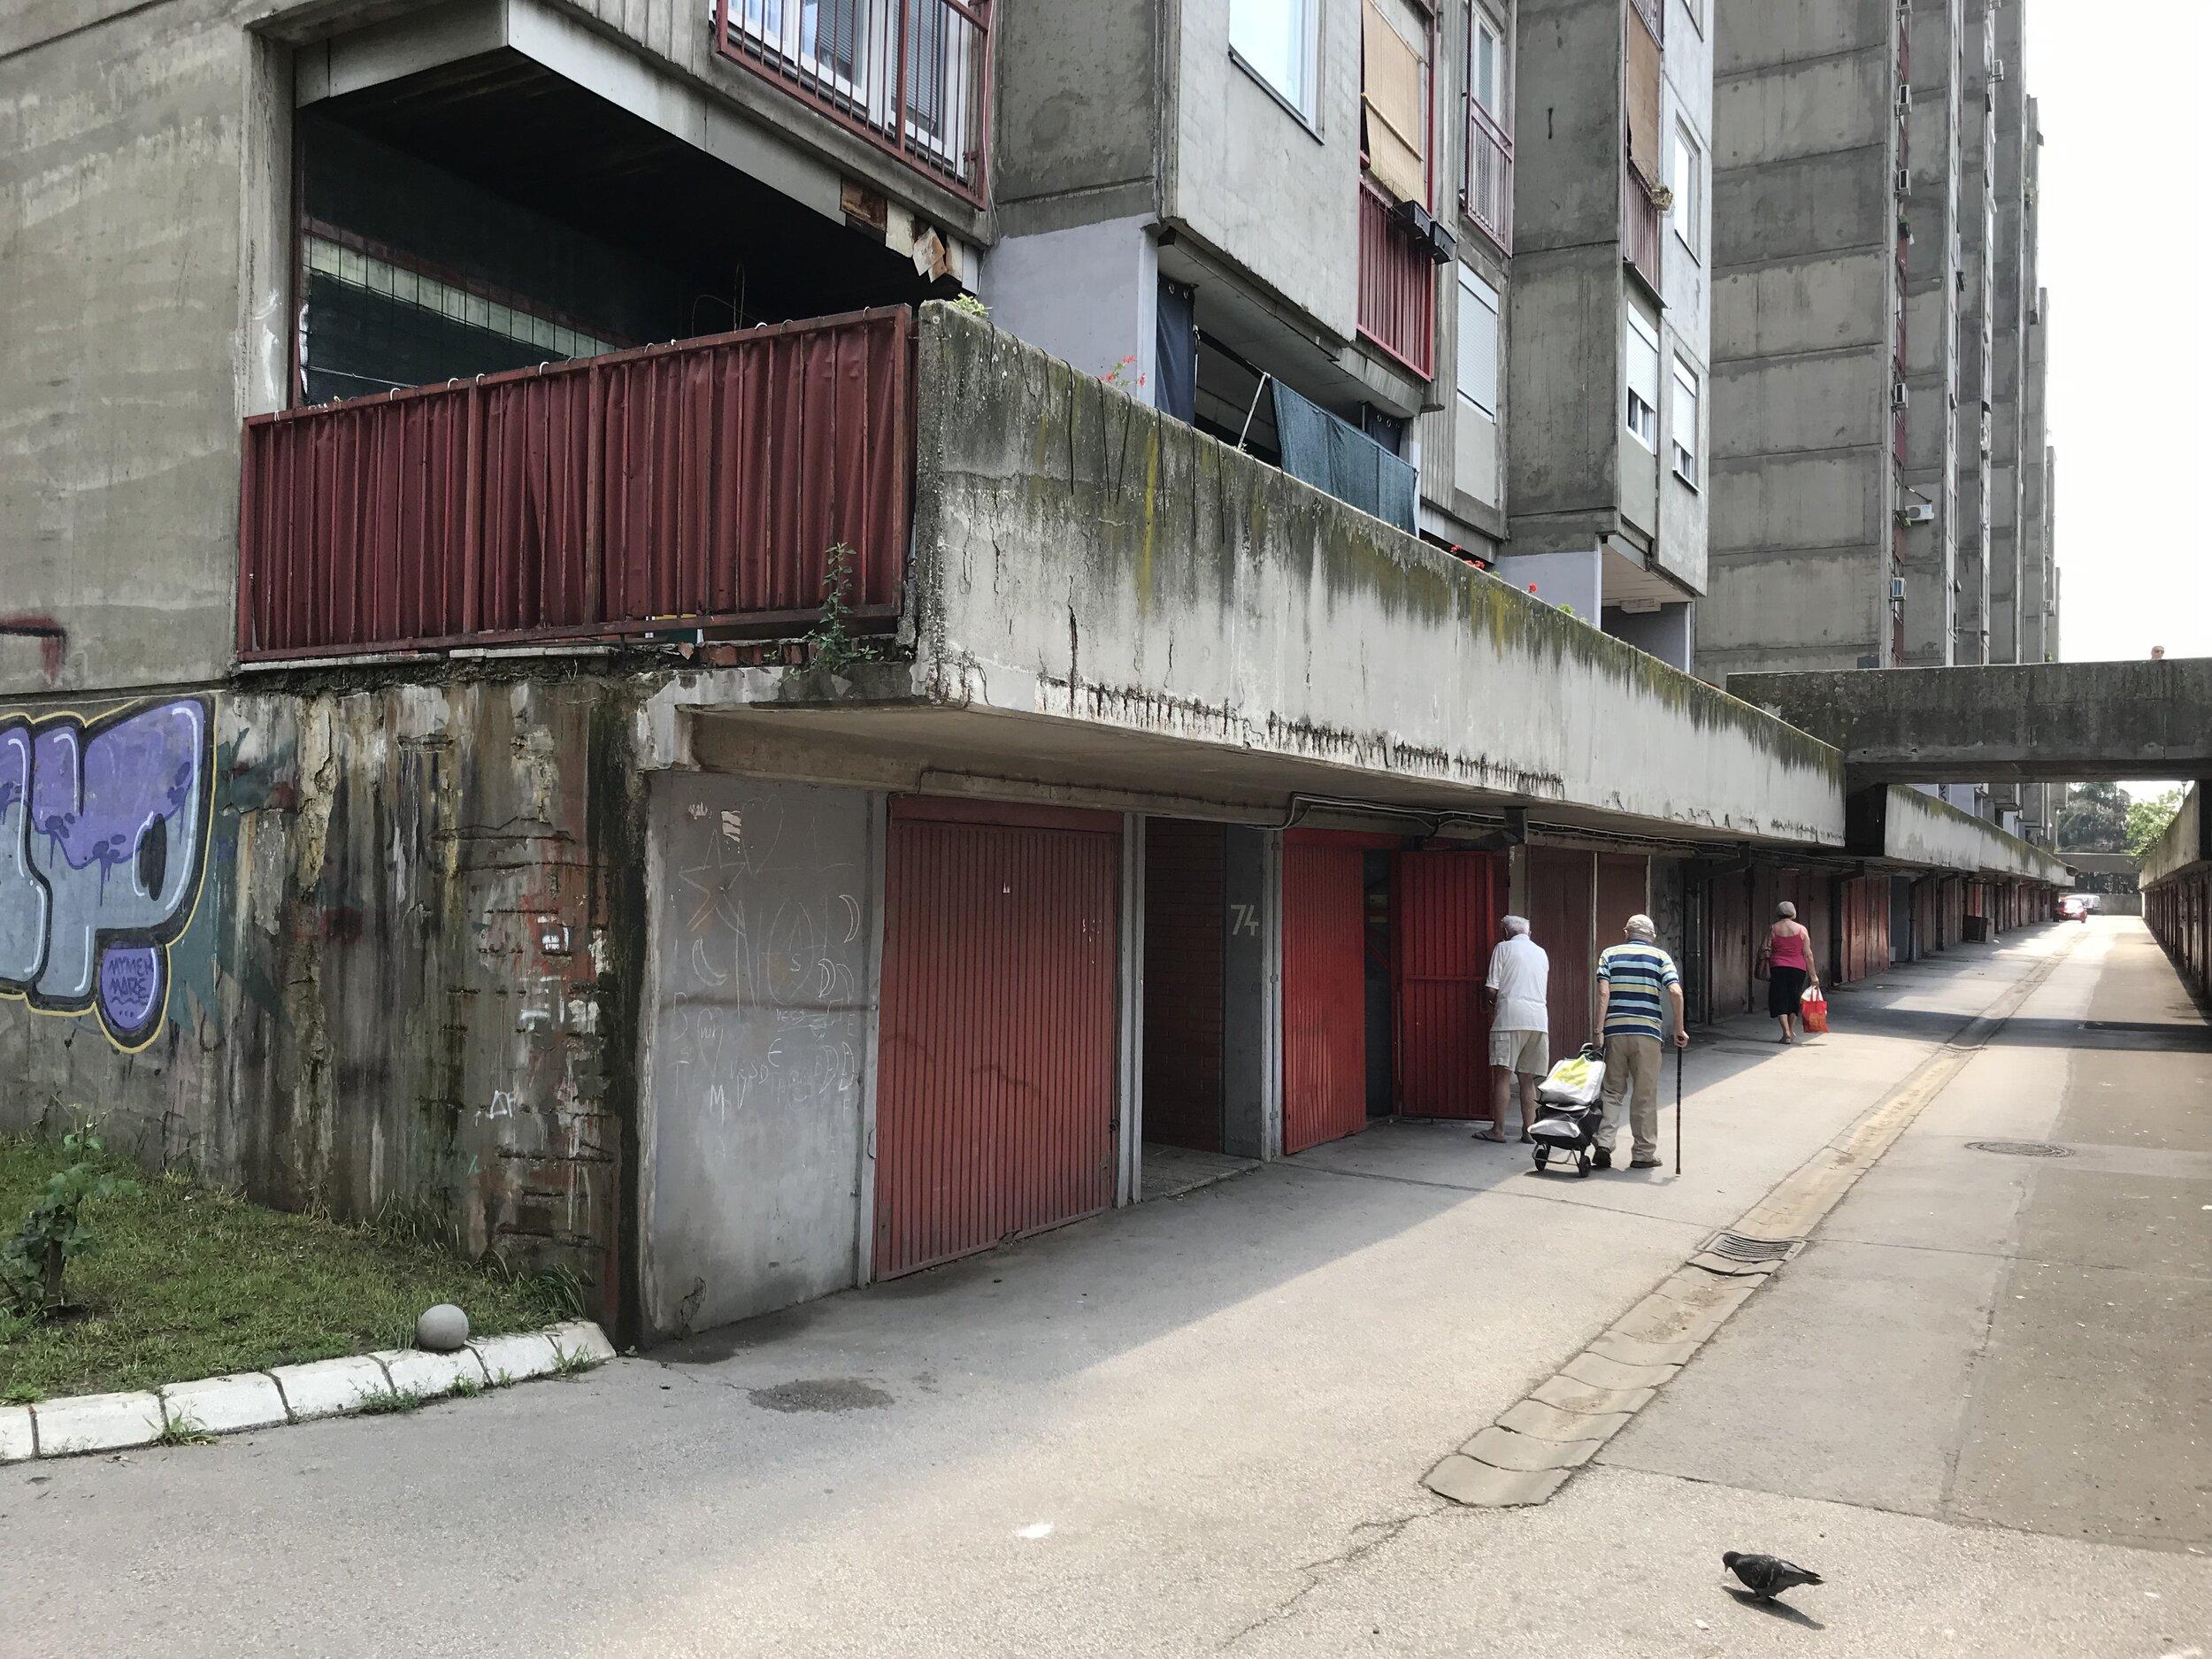 Figure 8. Bežanijski_03: Residents access their basement storage units in Block 63, Bežanijski blokovi, 2019. Photograph by Michael R. Allen.